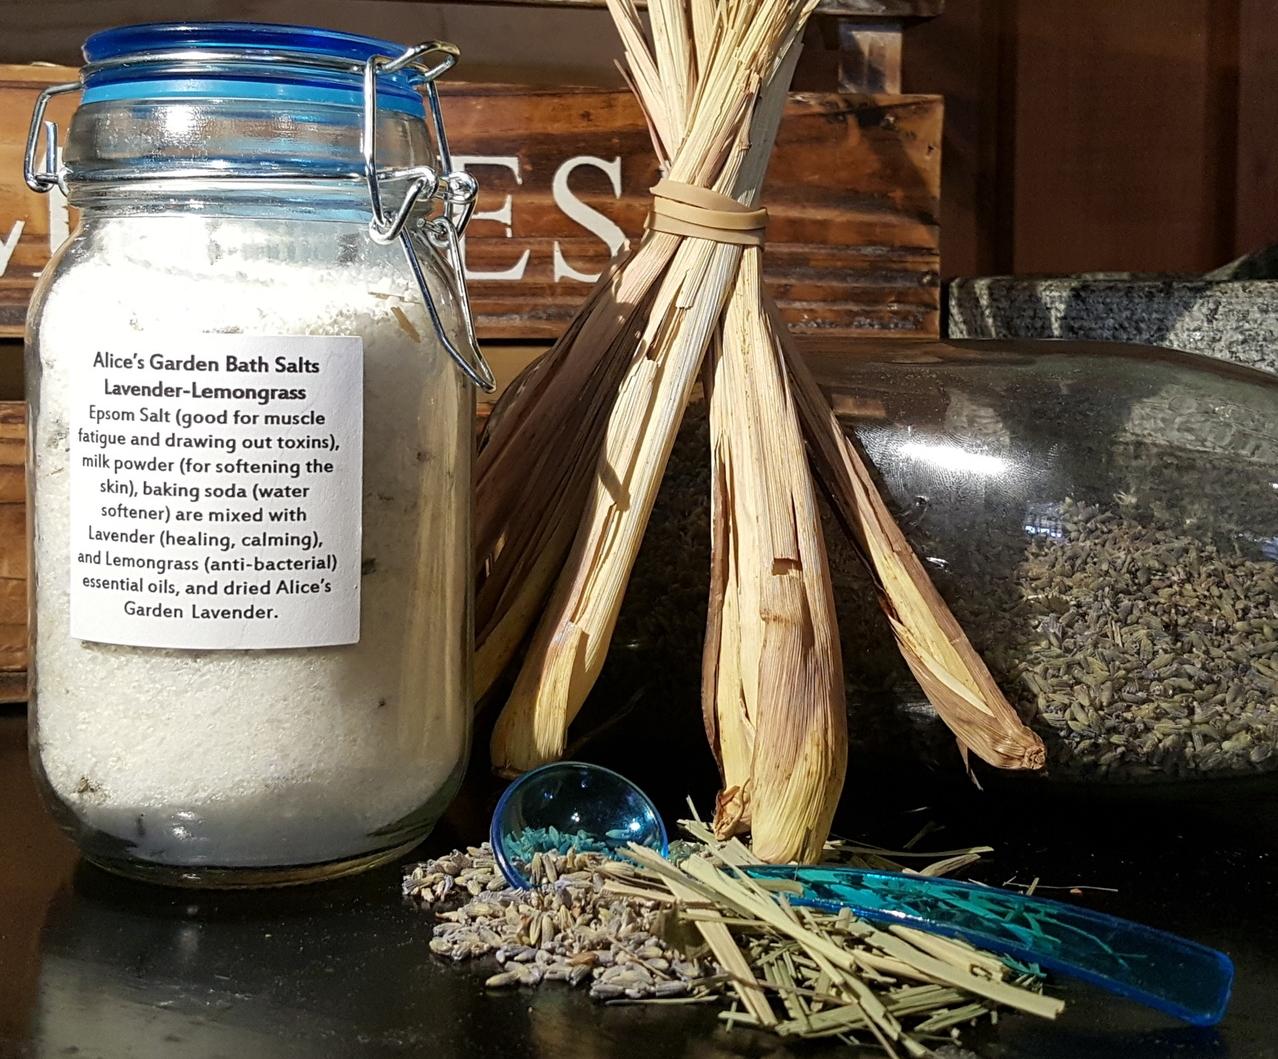 Lavender-Lemongrass Bath Salts(8oz) — Alice's Garden Urban Farm